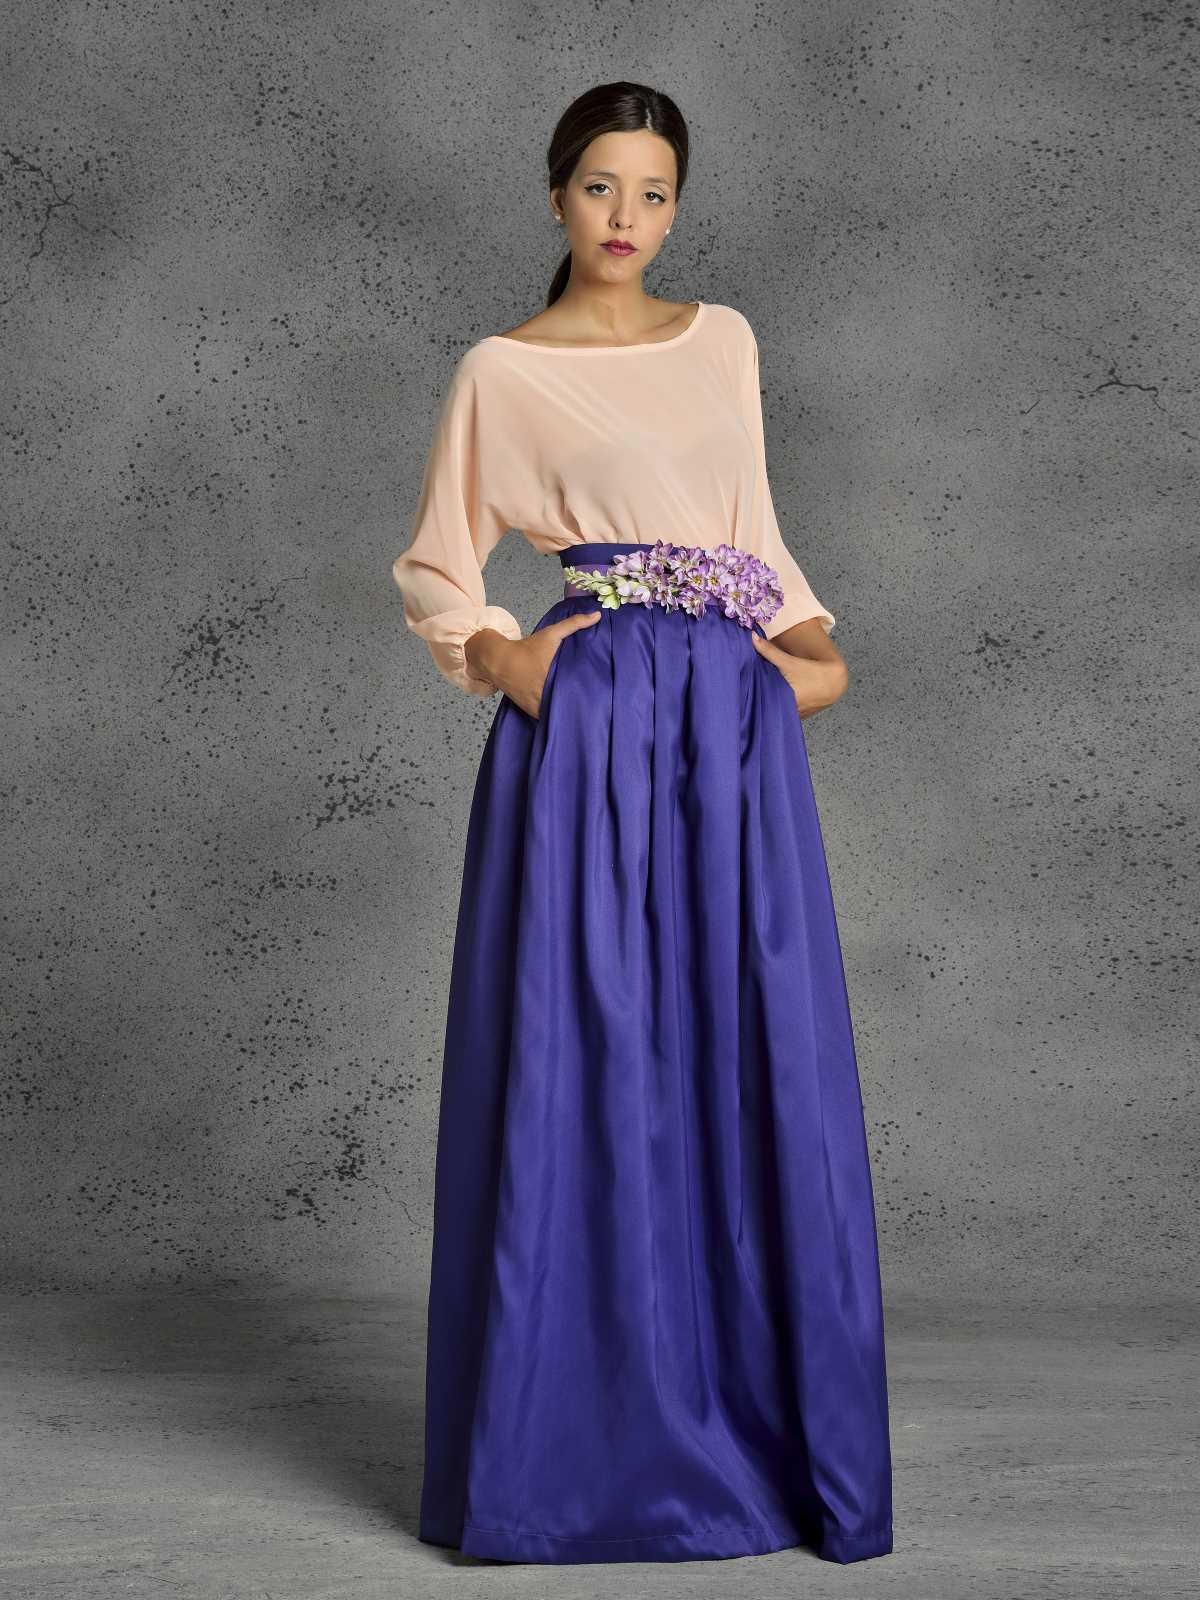 falda larga de fiesta morada de fatima angulo